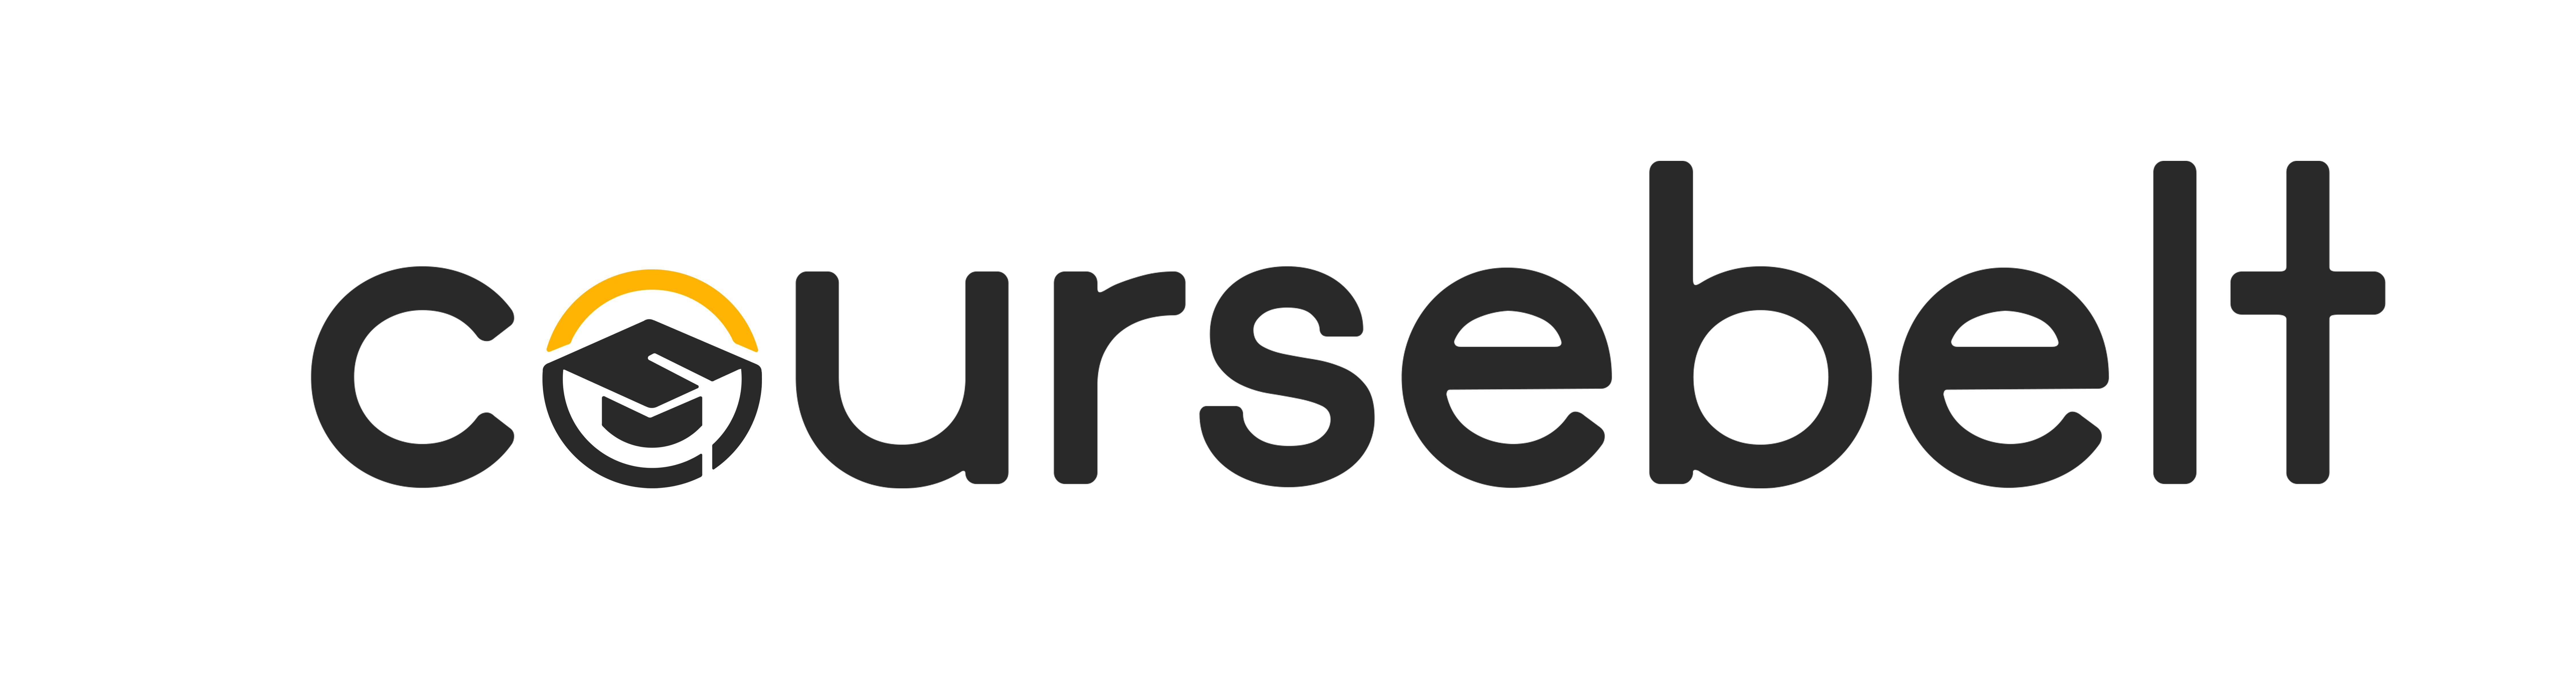 Course Belt